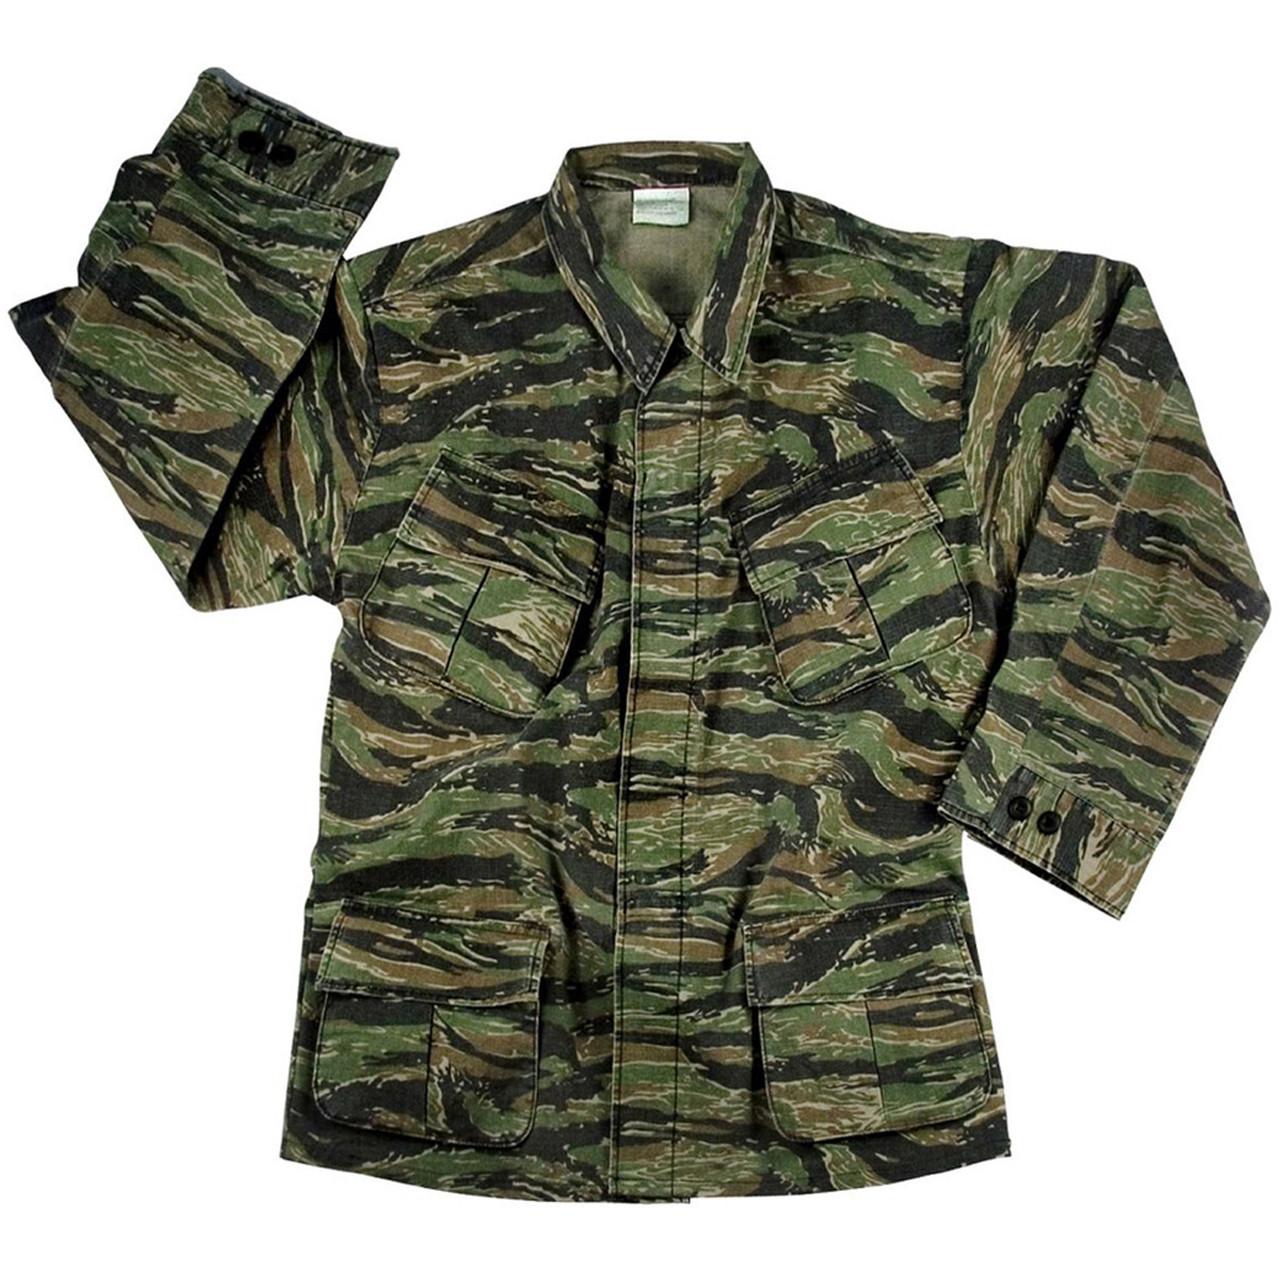 a5419d2560a Shop Vintage Vietnam Tiger Stripe Jungle Jackets - Fatigues Army Navy Gear